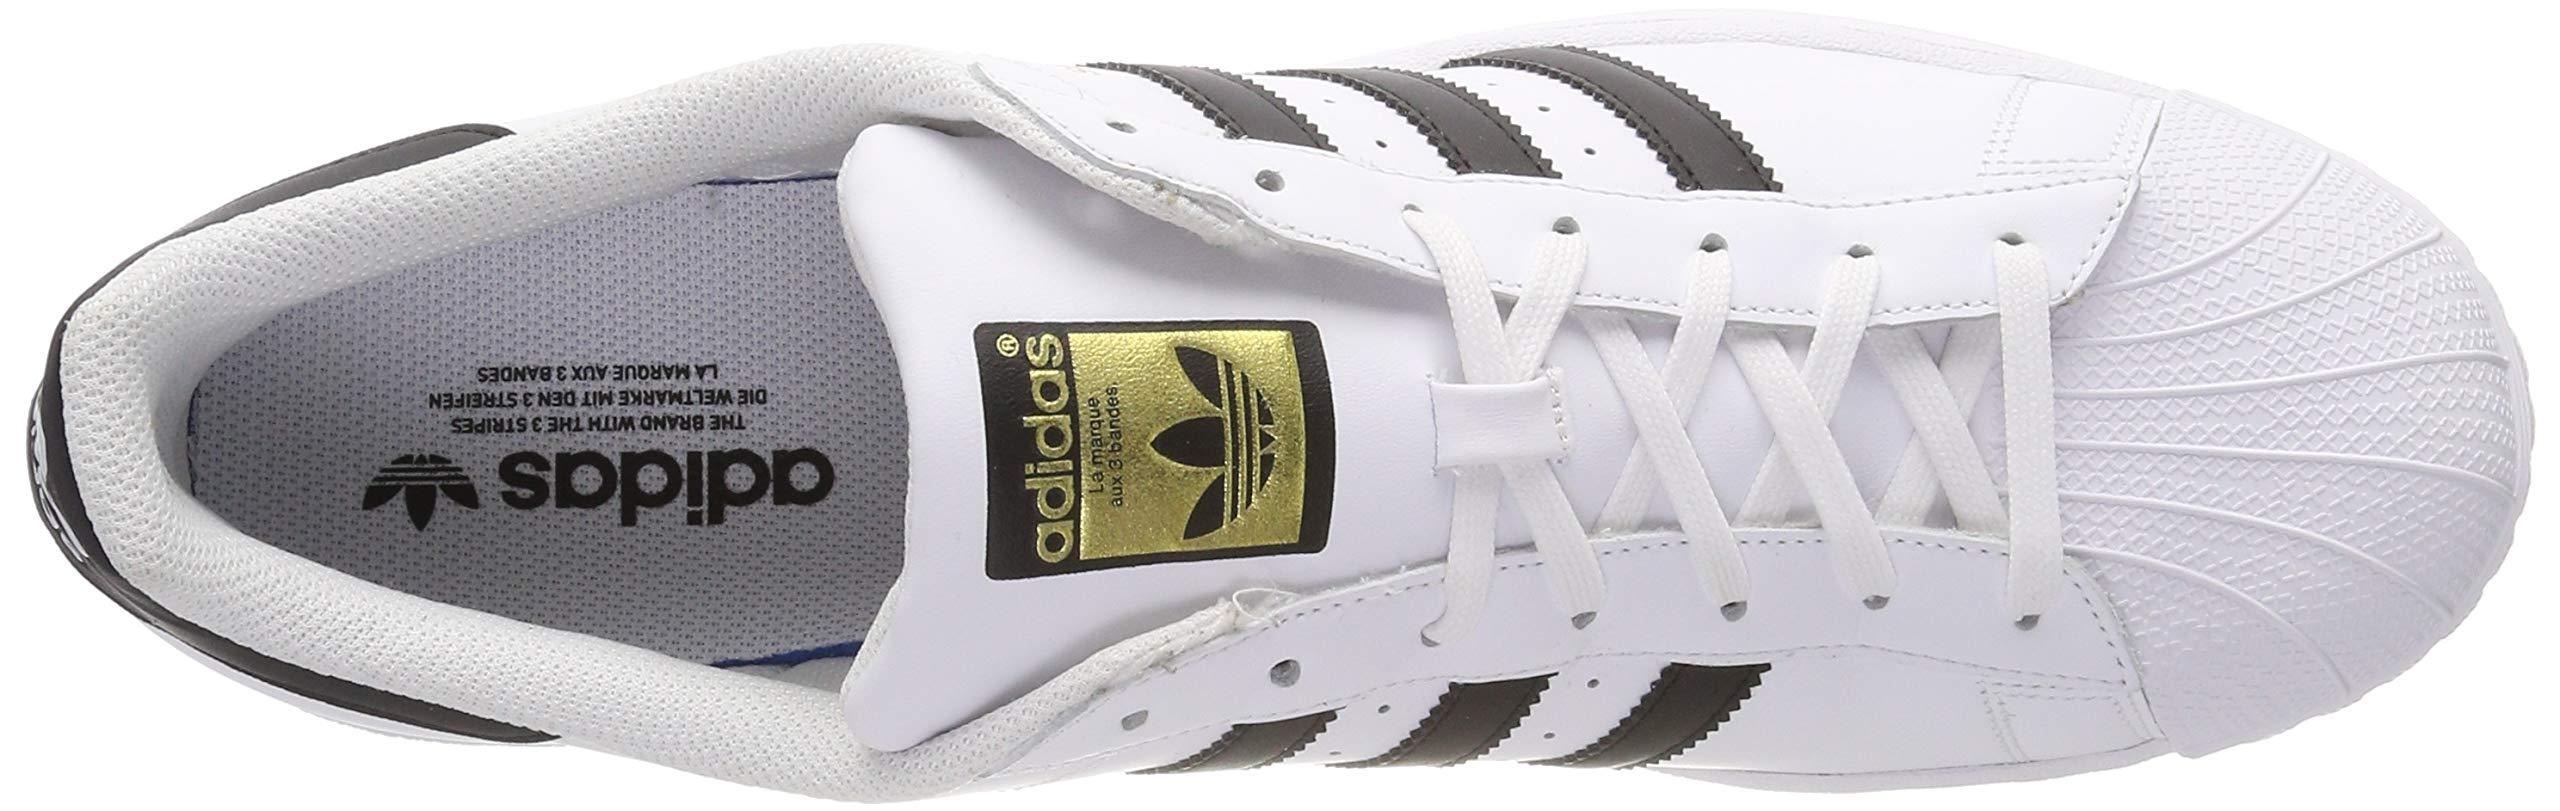 Adidas Originals Superstar Foundation Scarpe da Ginnastica Unisex Adulto Face Shop